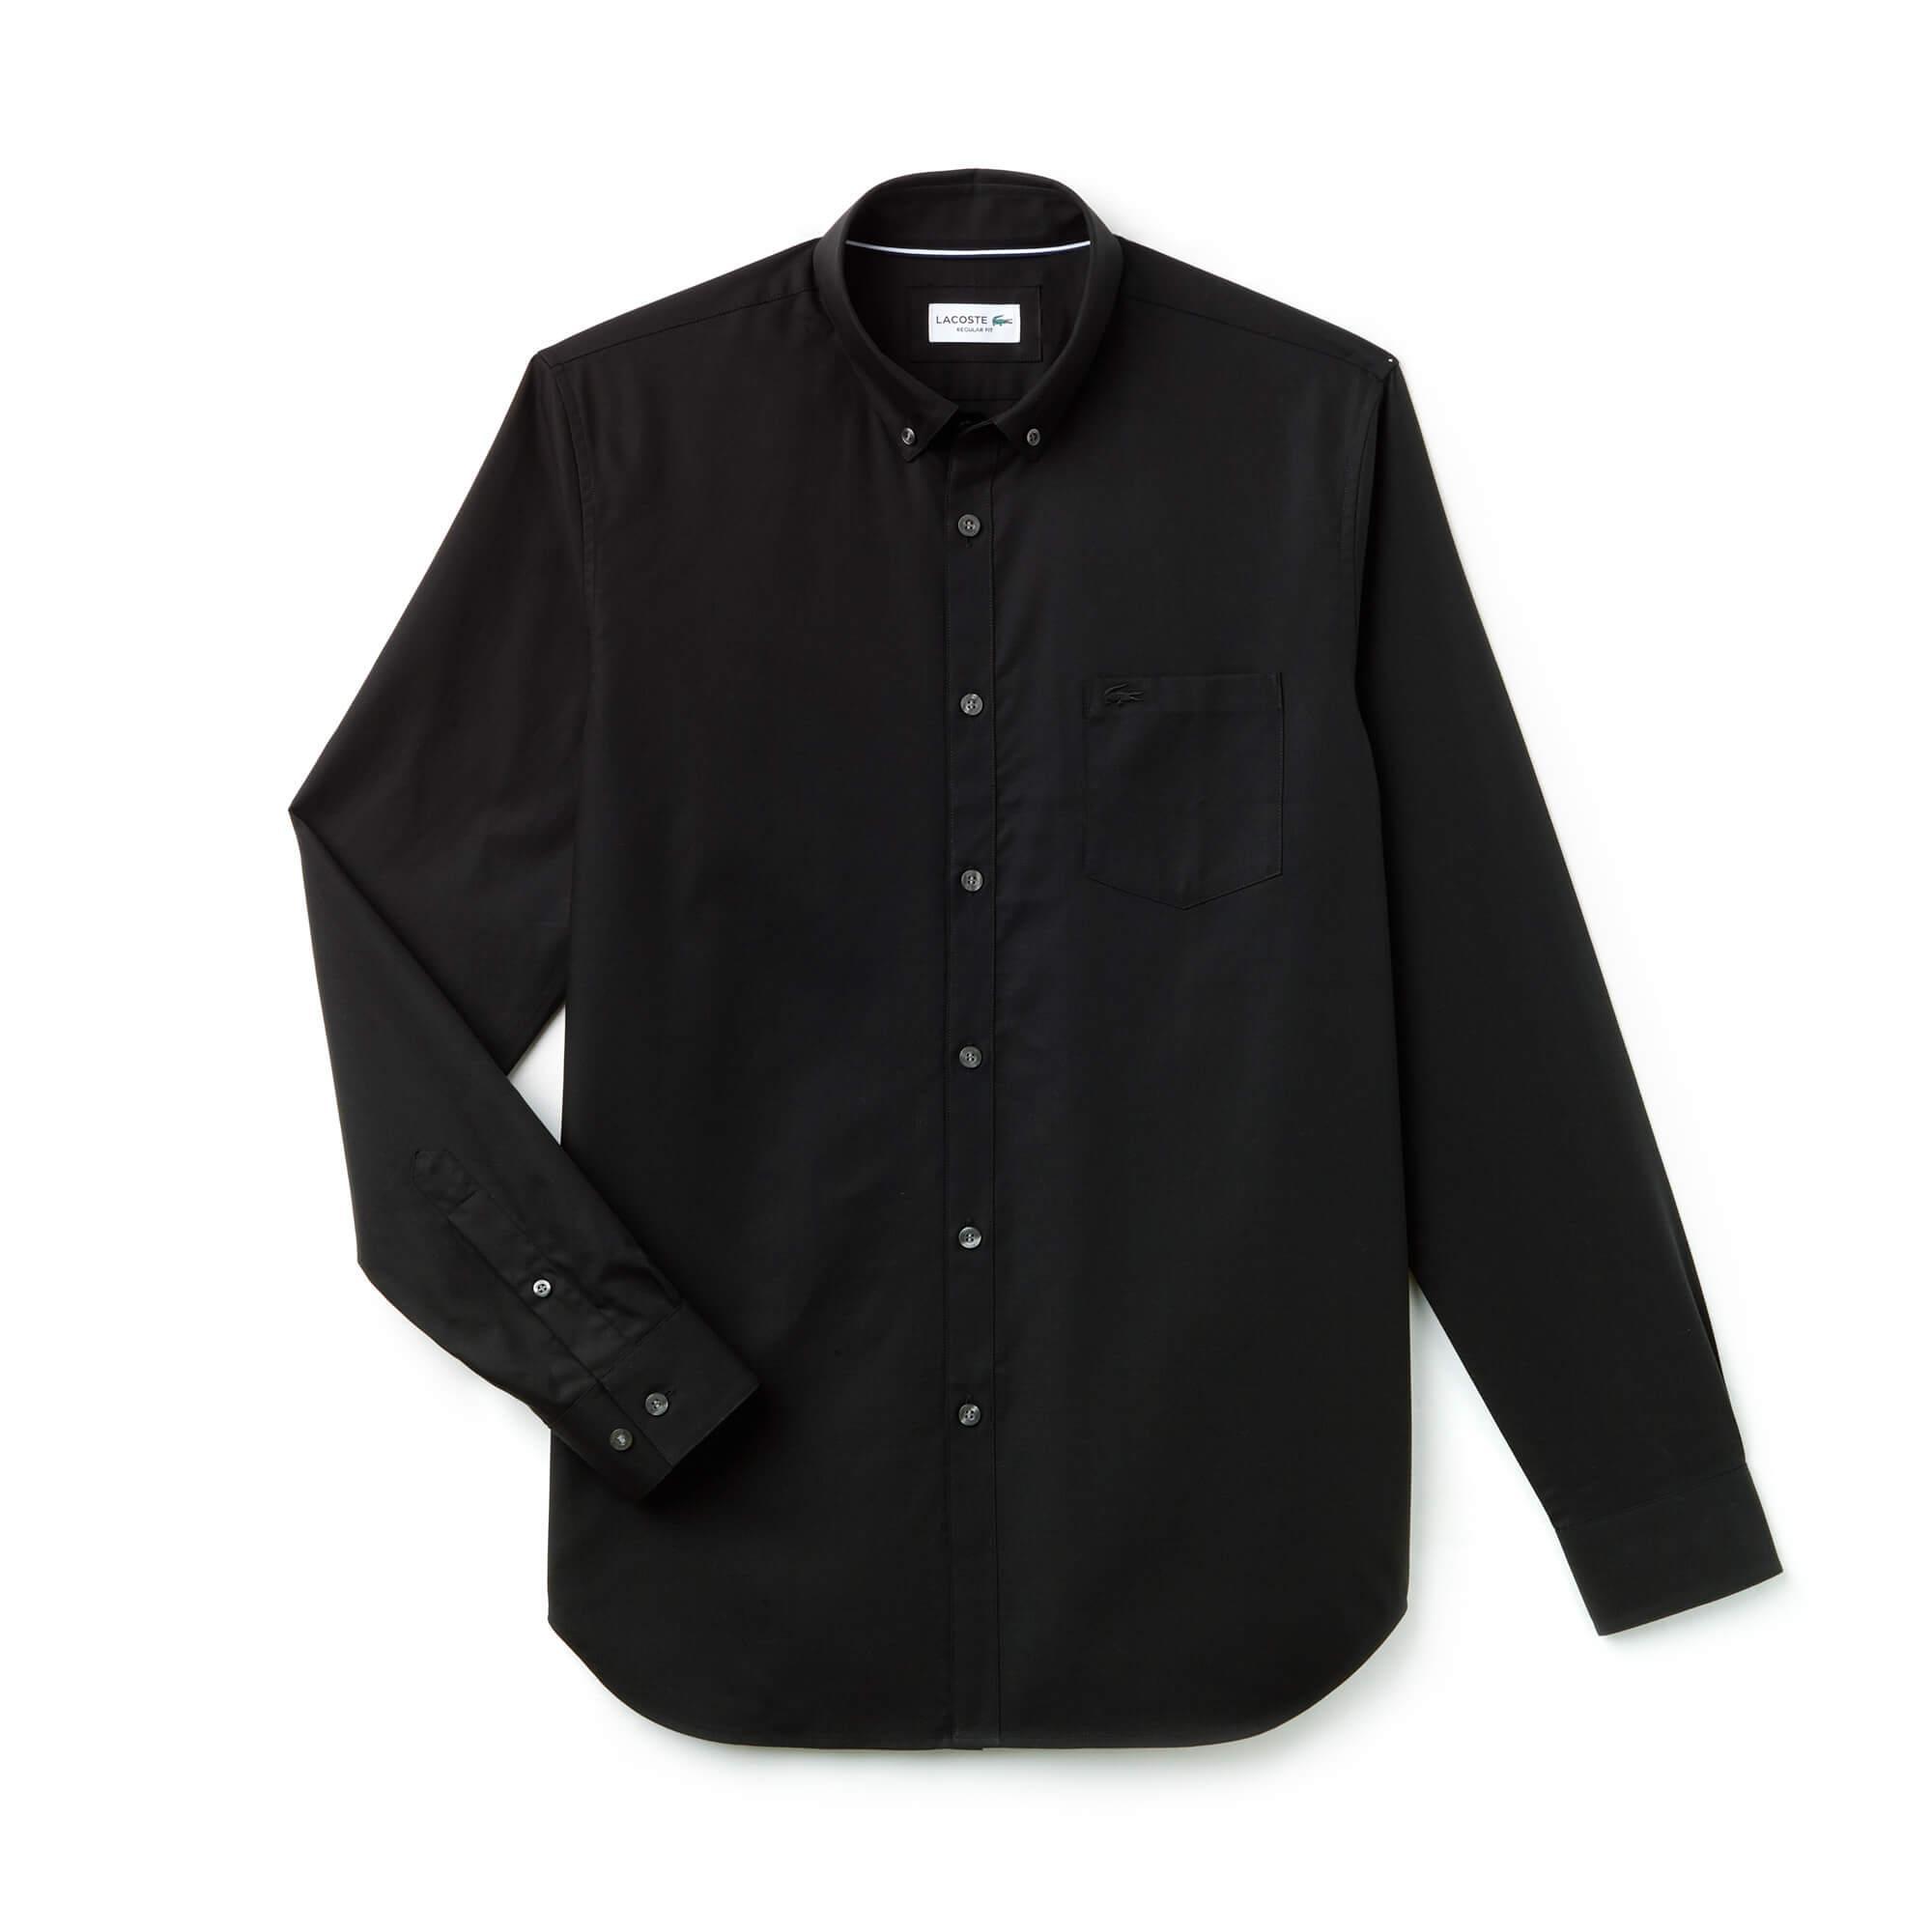 Lacoste Erkek Klasik Fit Siyah Gömlek